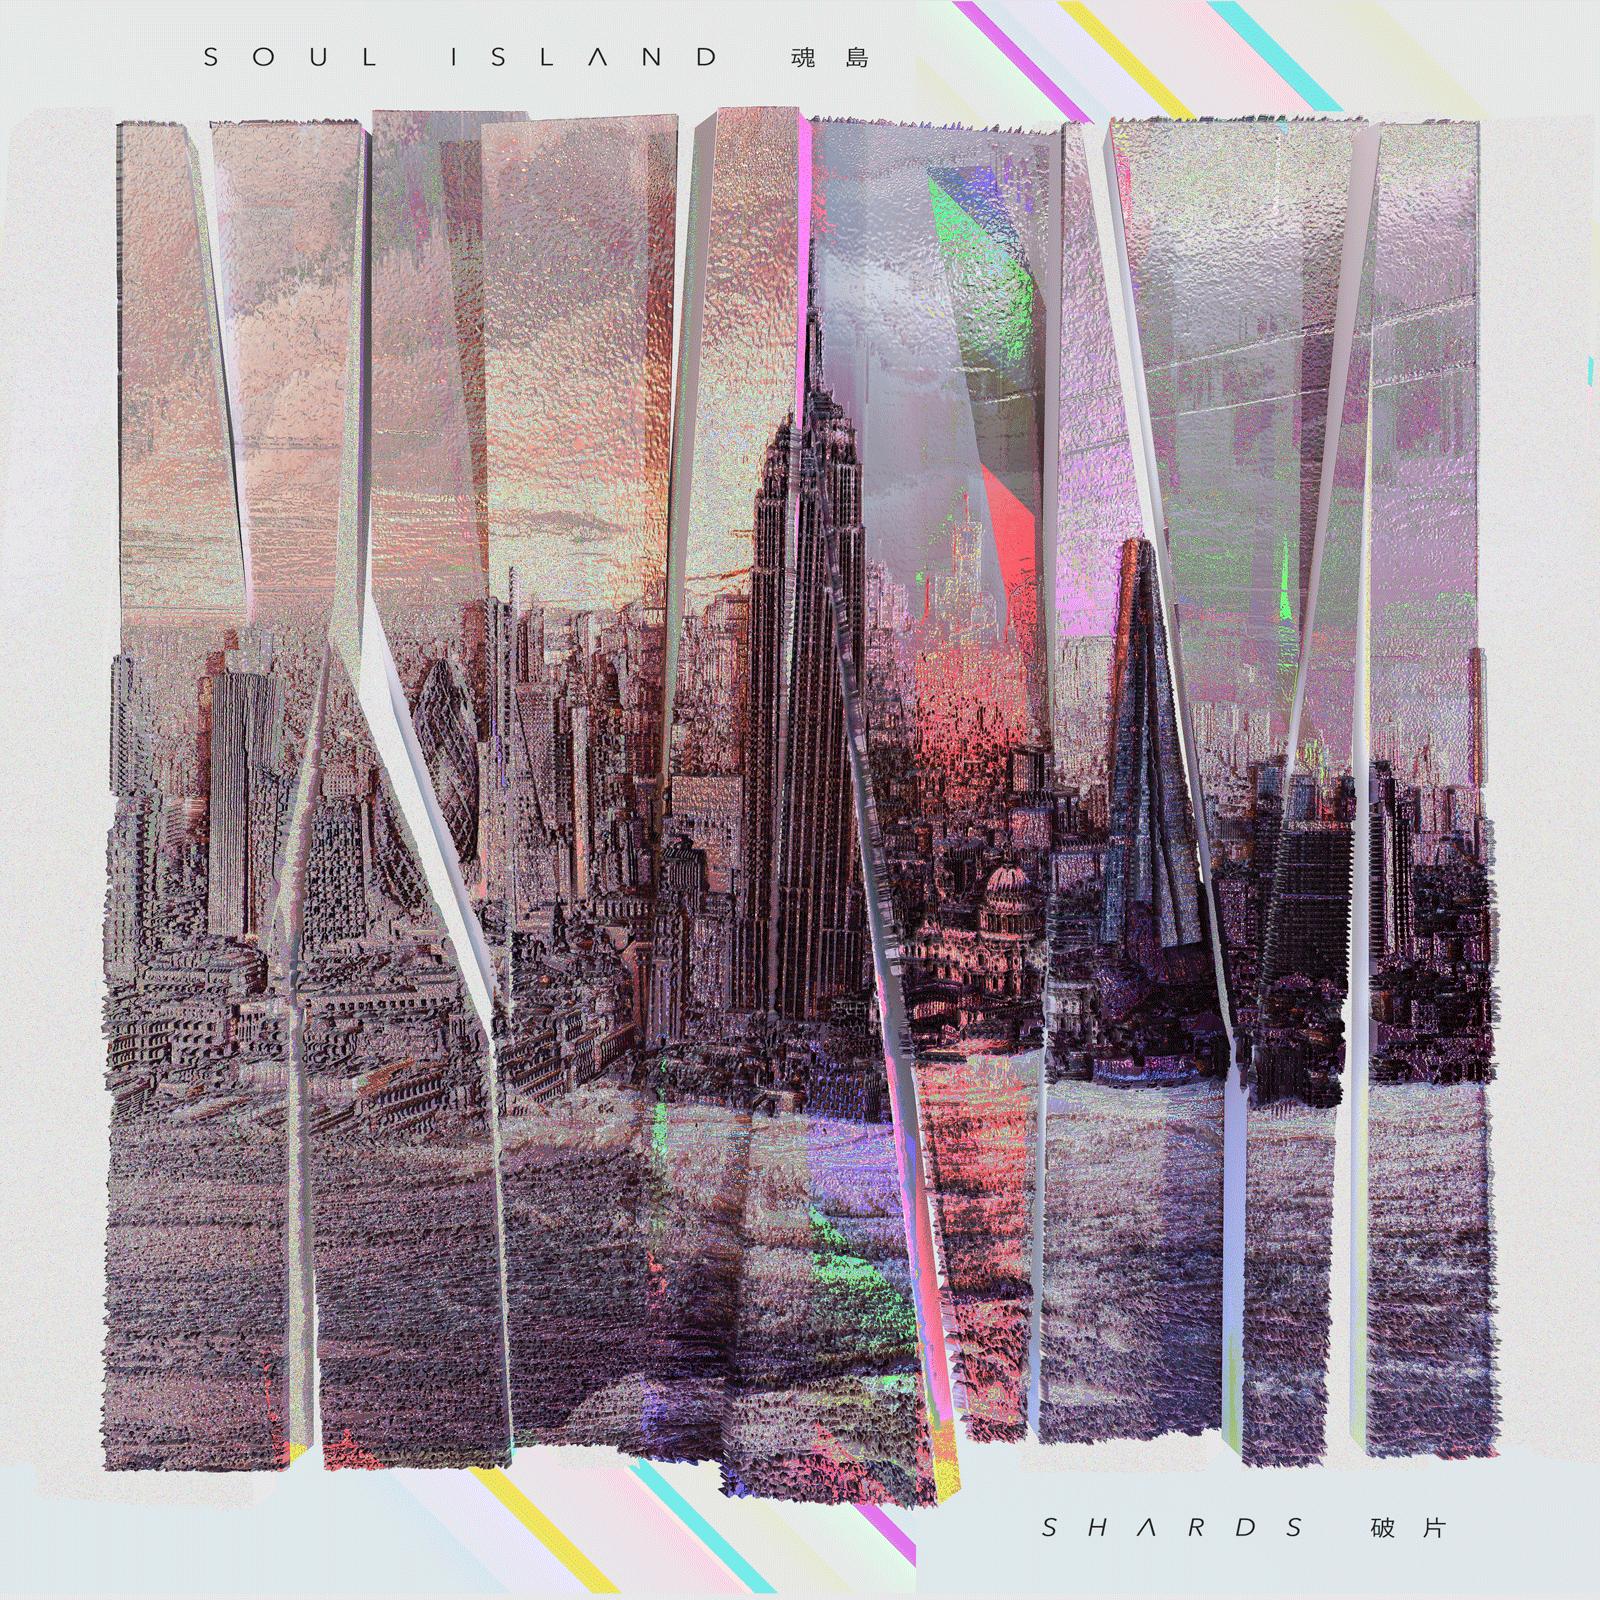 Soul Island - Shards - 2018